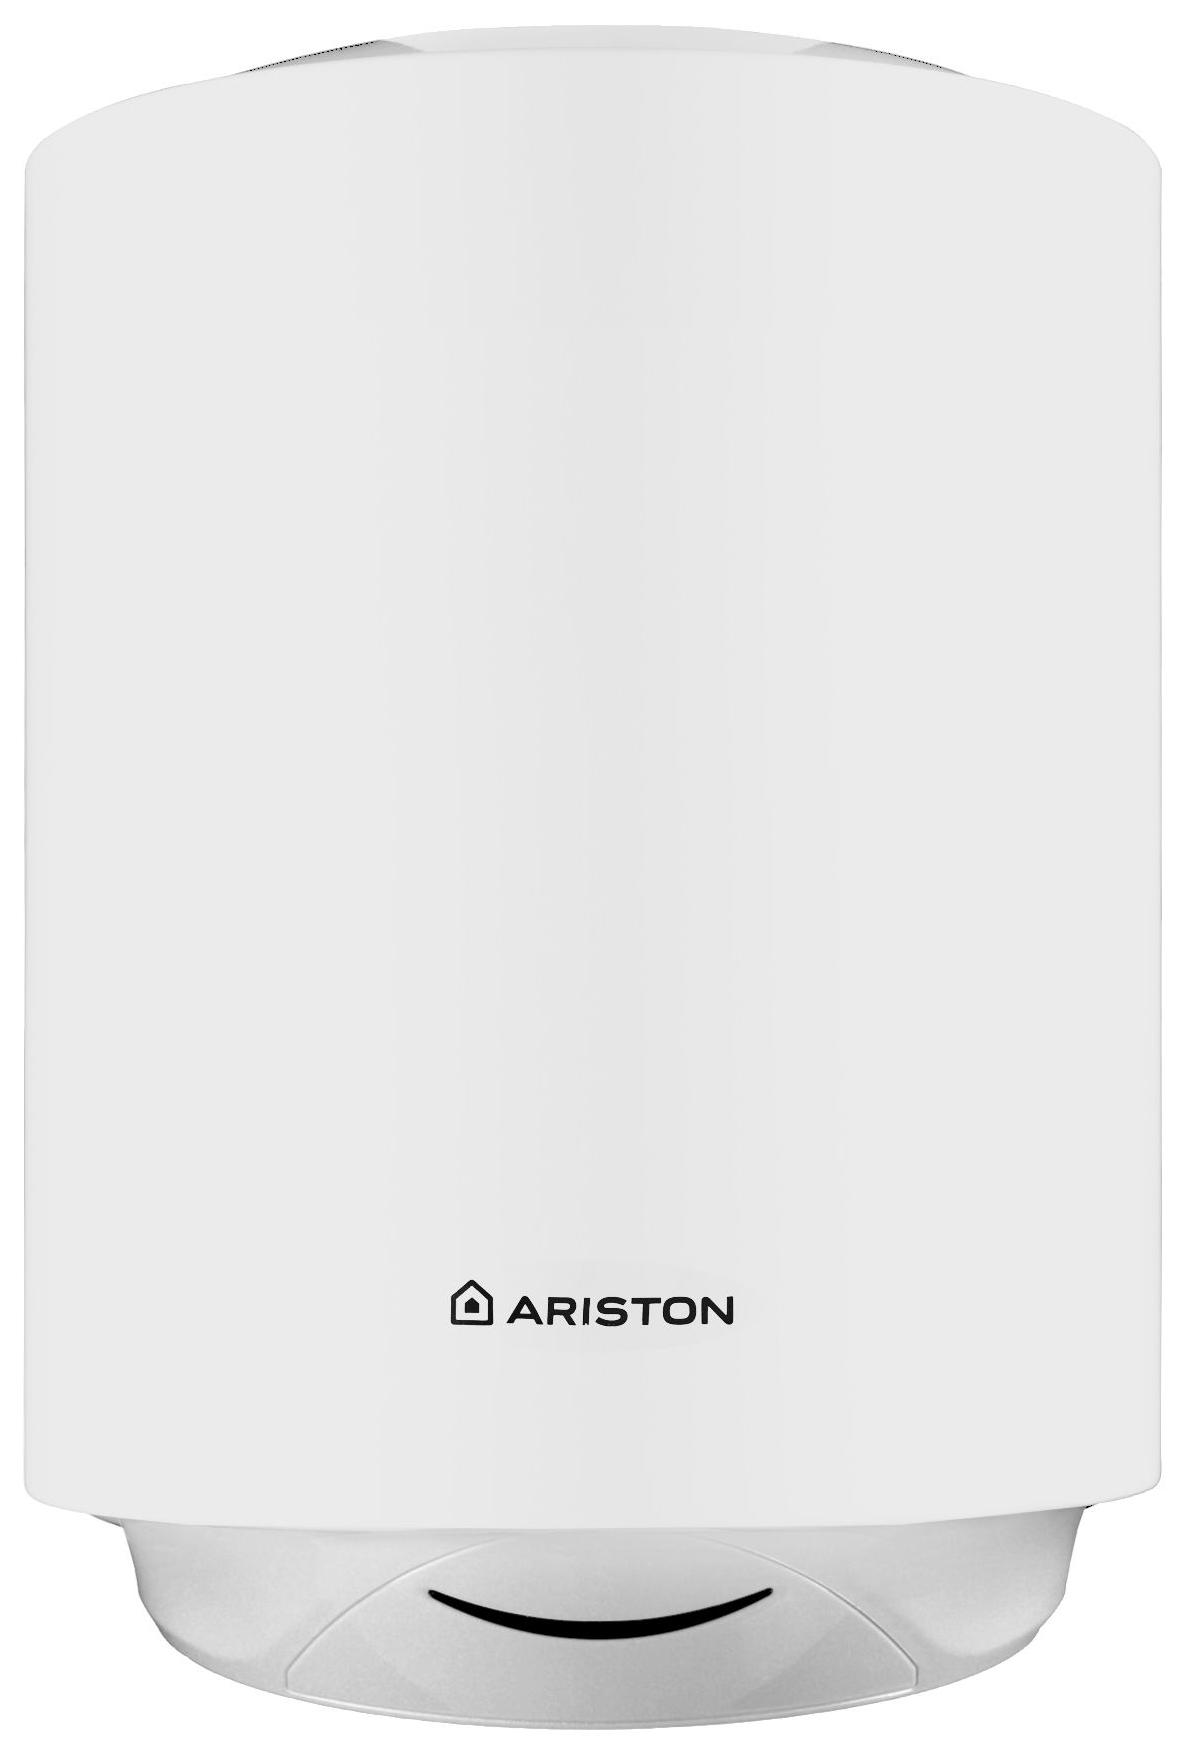 ARISTON ABS PRO R 30 V SLIM